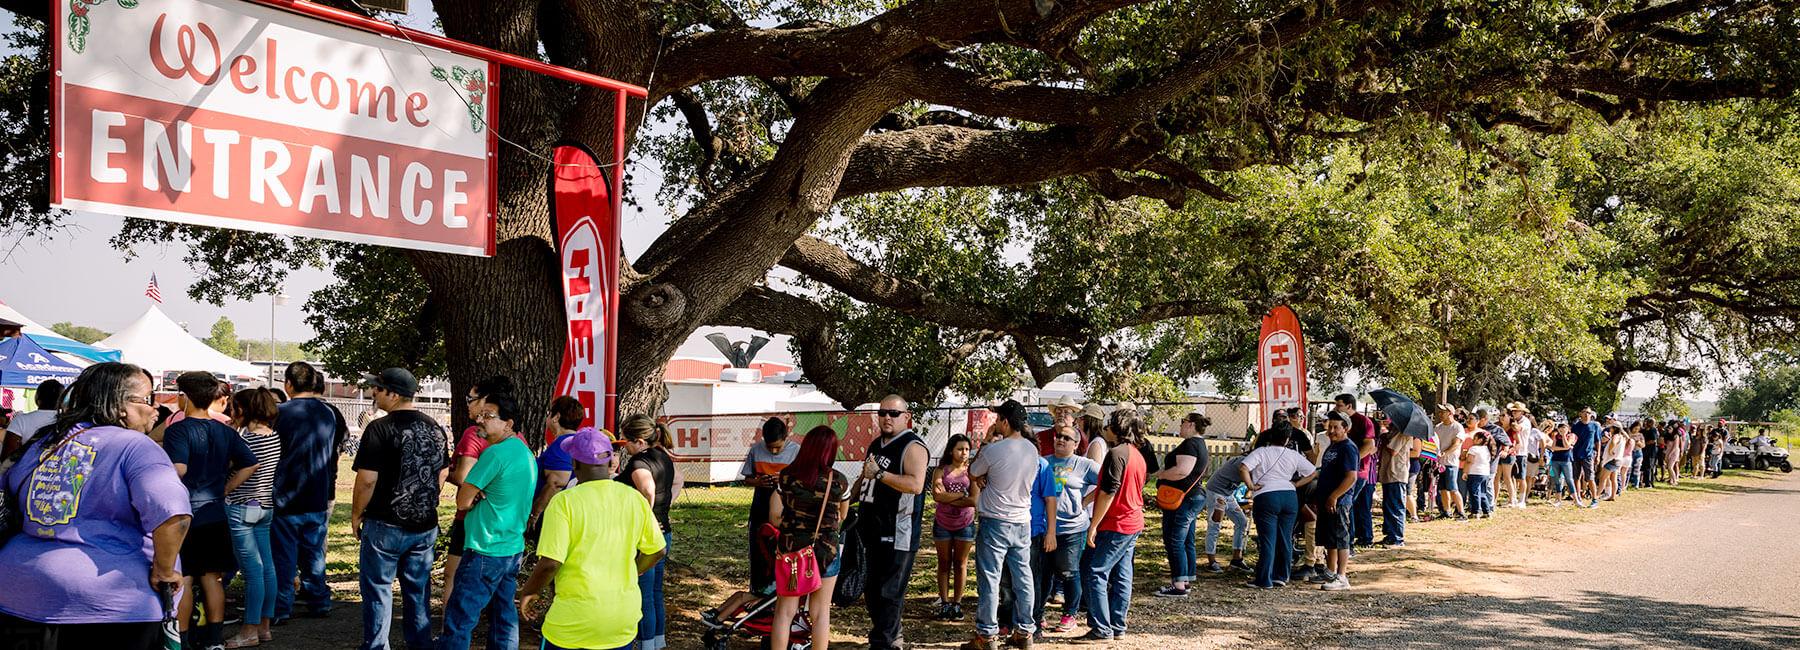 Ponchatoula Strawberry Festival 2020.Poteet Strawberry Festival 2020 Lineup Festival 2020